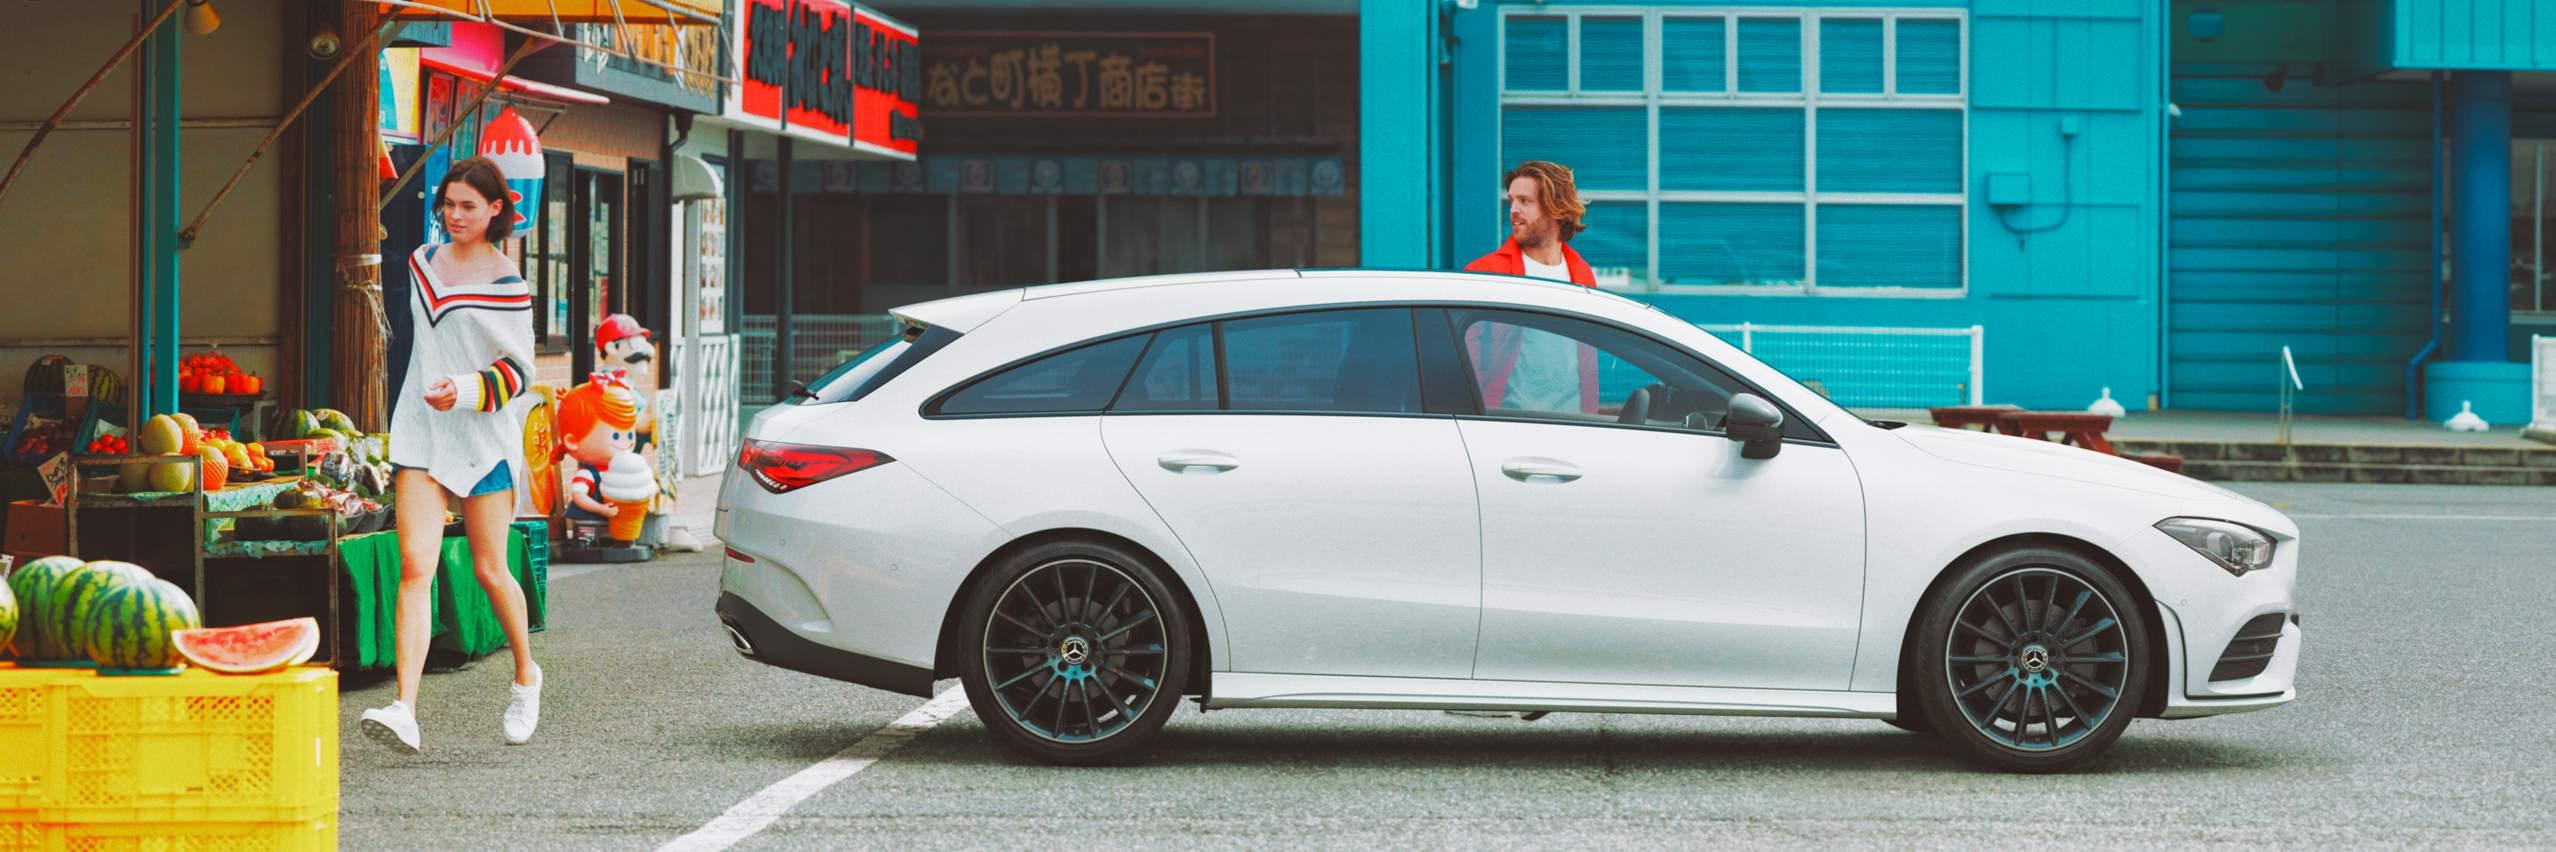 CAR-Avenue-Mercedes-Benz-Classe-CLA-Shooting-Brake-05